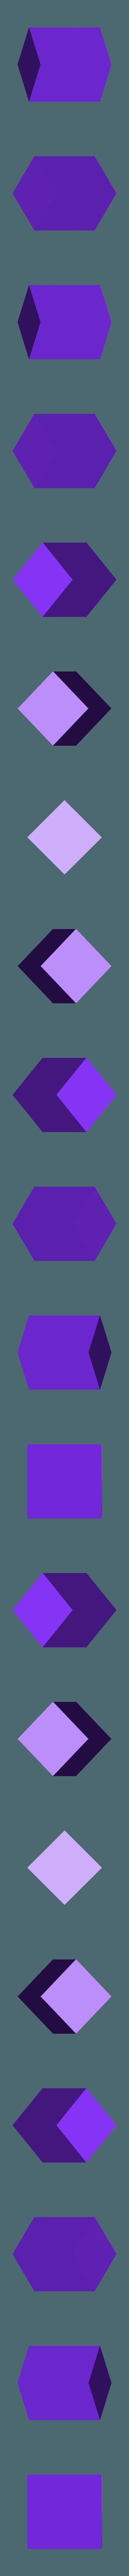 Junction.stl Download free STL file Navi the Fairy (Zelda Ocarina of Time) • 3D printable design, conceptify